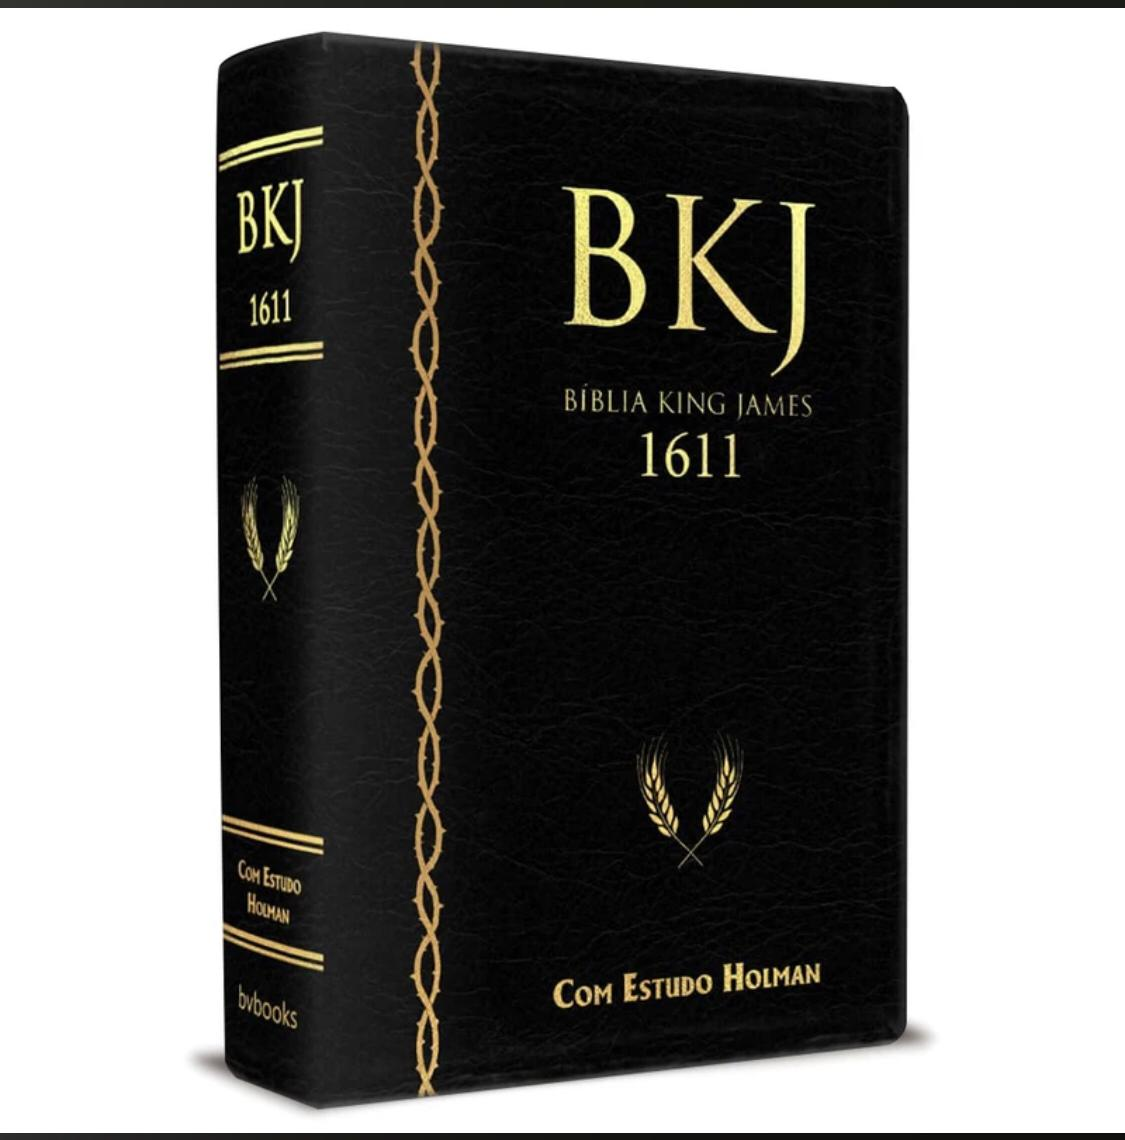 Bíblia King James 1611 Com Estudo Holman BKJ Preta Luxo